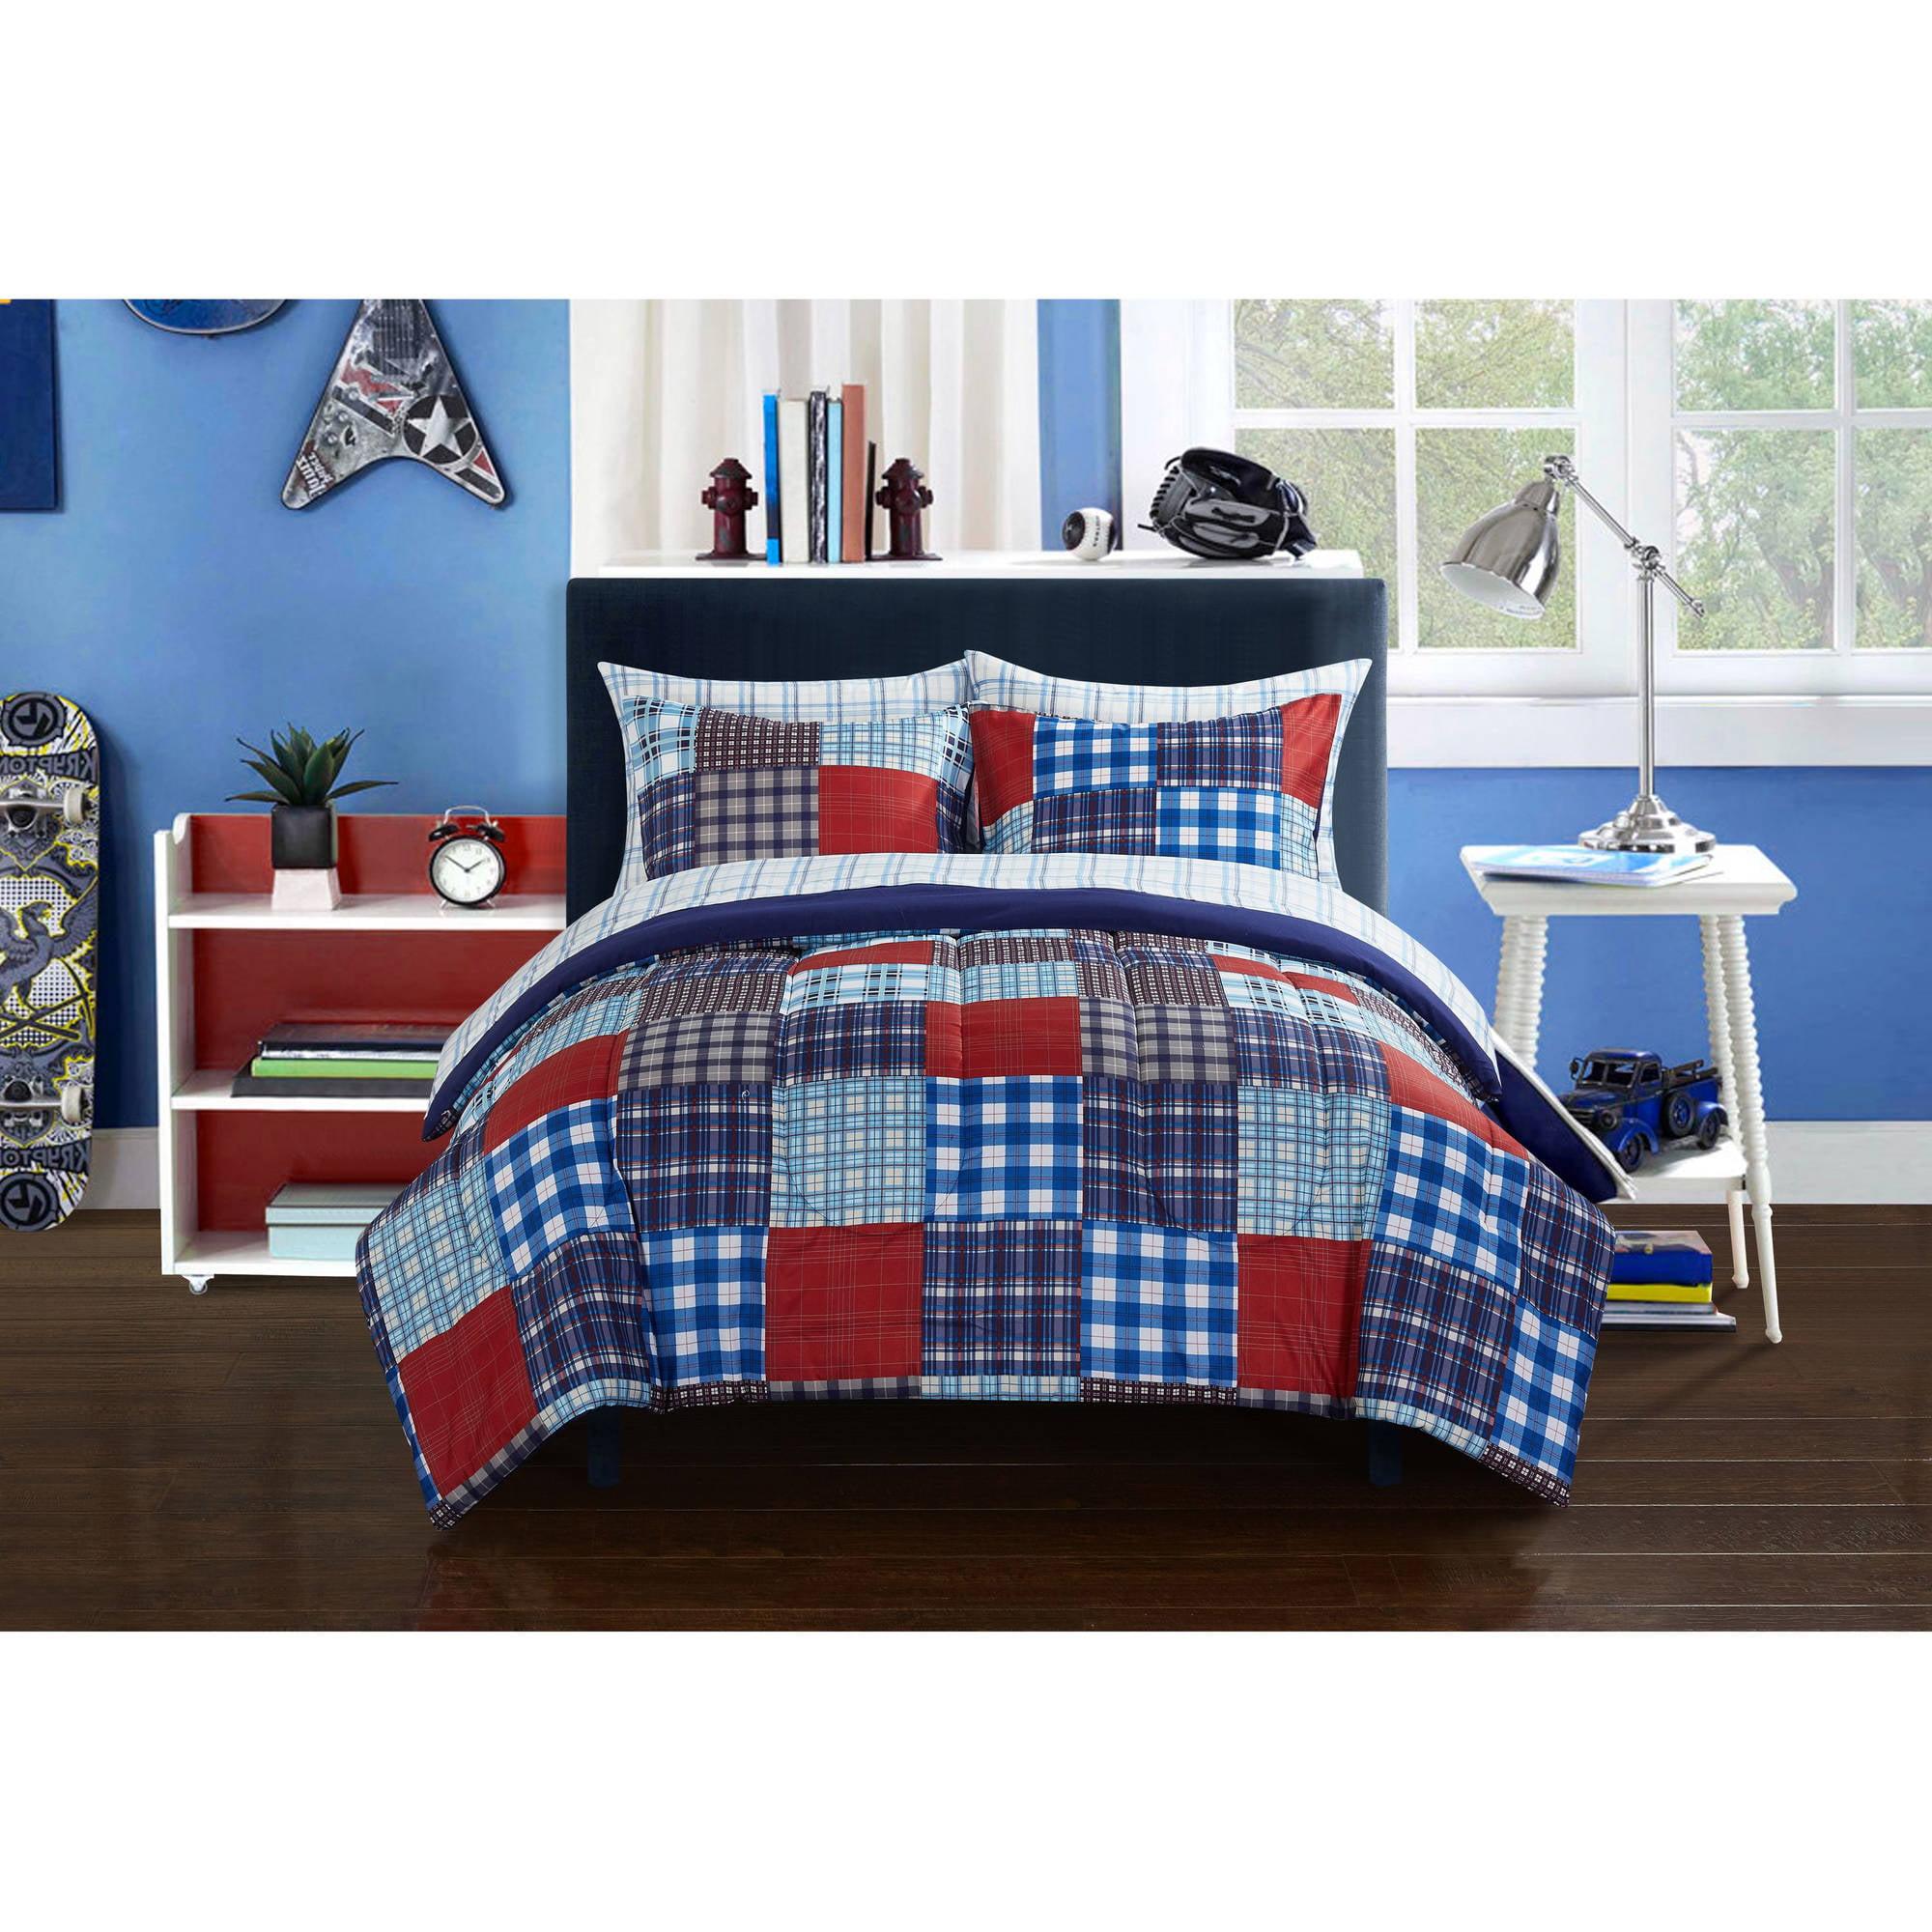 factor blue amazing comforter plan grey comforters steel and bed bedding set sets for graceful captivating bedspreads